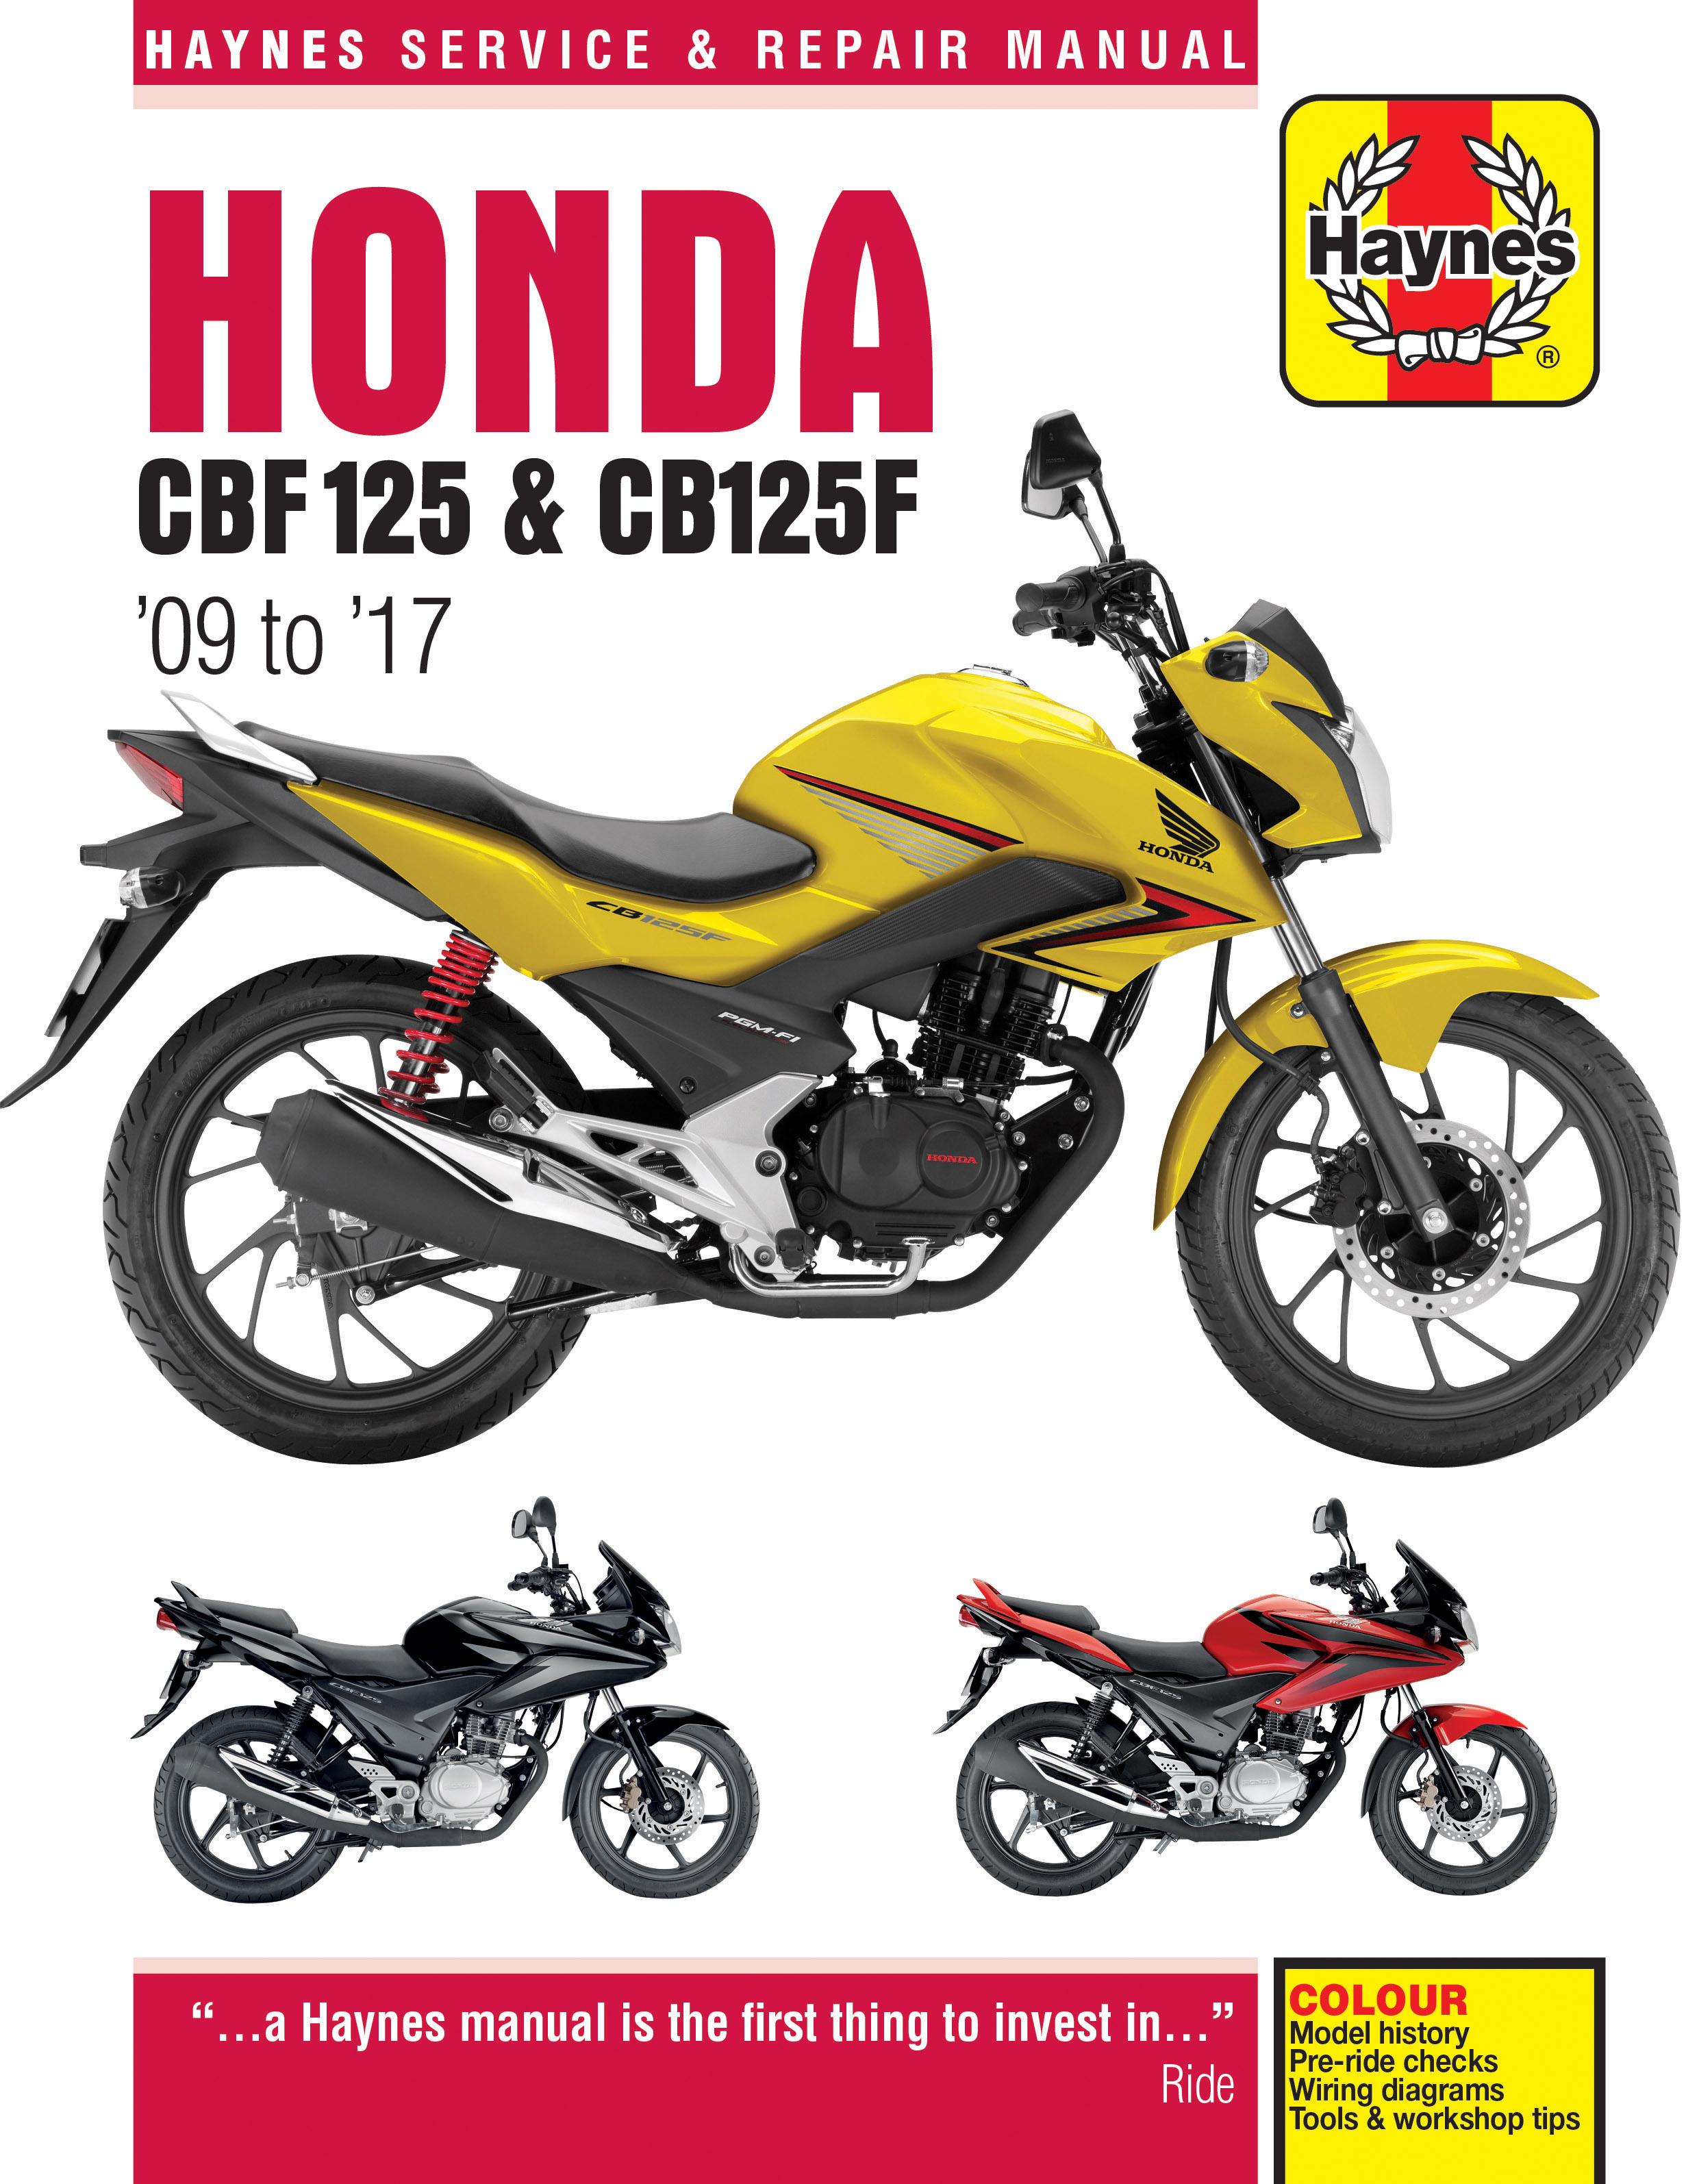 Honda cbf125 09 17 haynes repair manual haynes publishing enlarge honda cbf125 09 17 haynes repair manual fandeluxe Choice Image